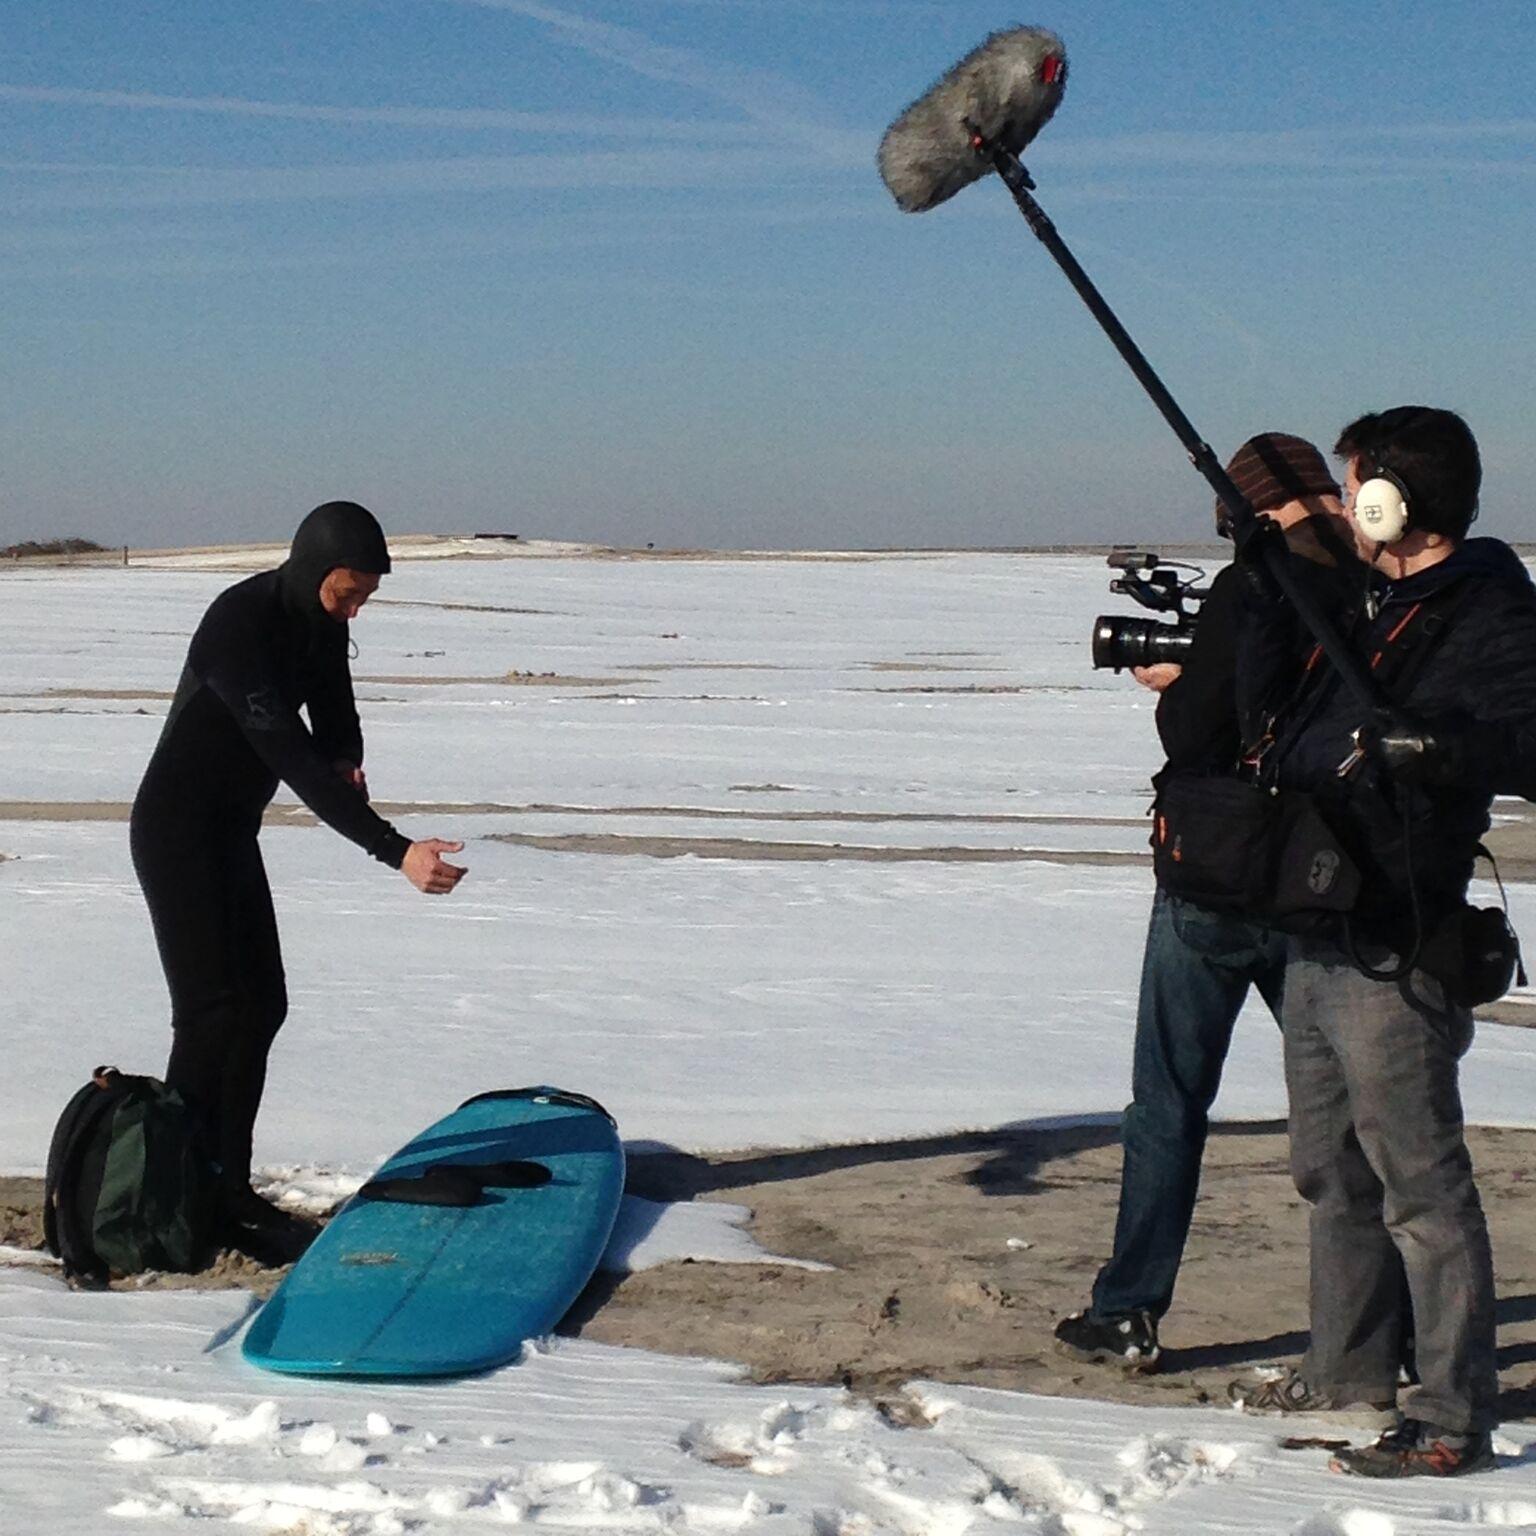 Maryland shoot, Paul Takemoto winter surfing